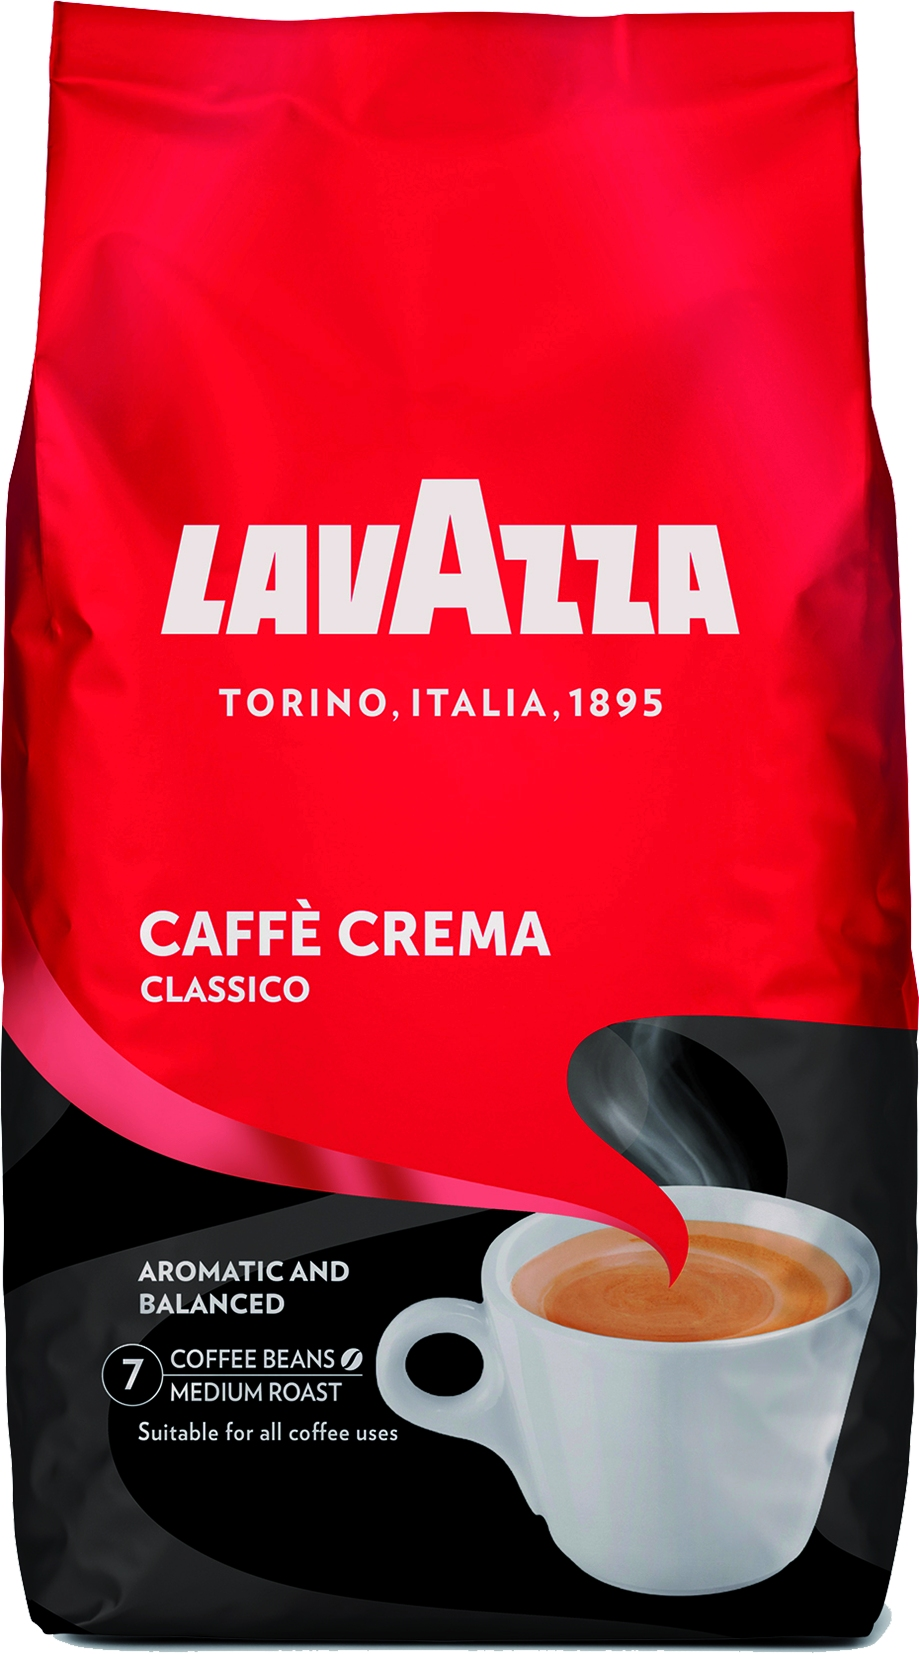 Cafe Crema Classico